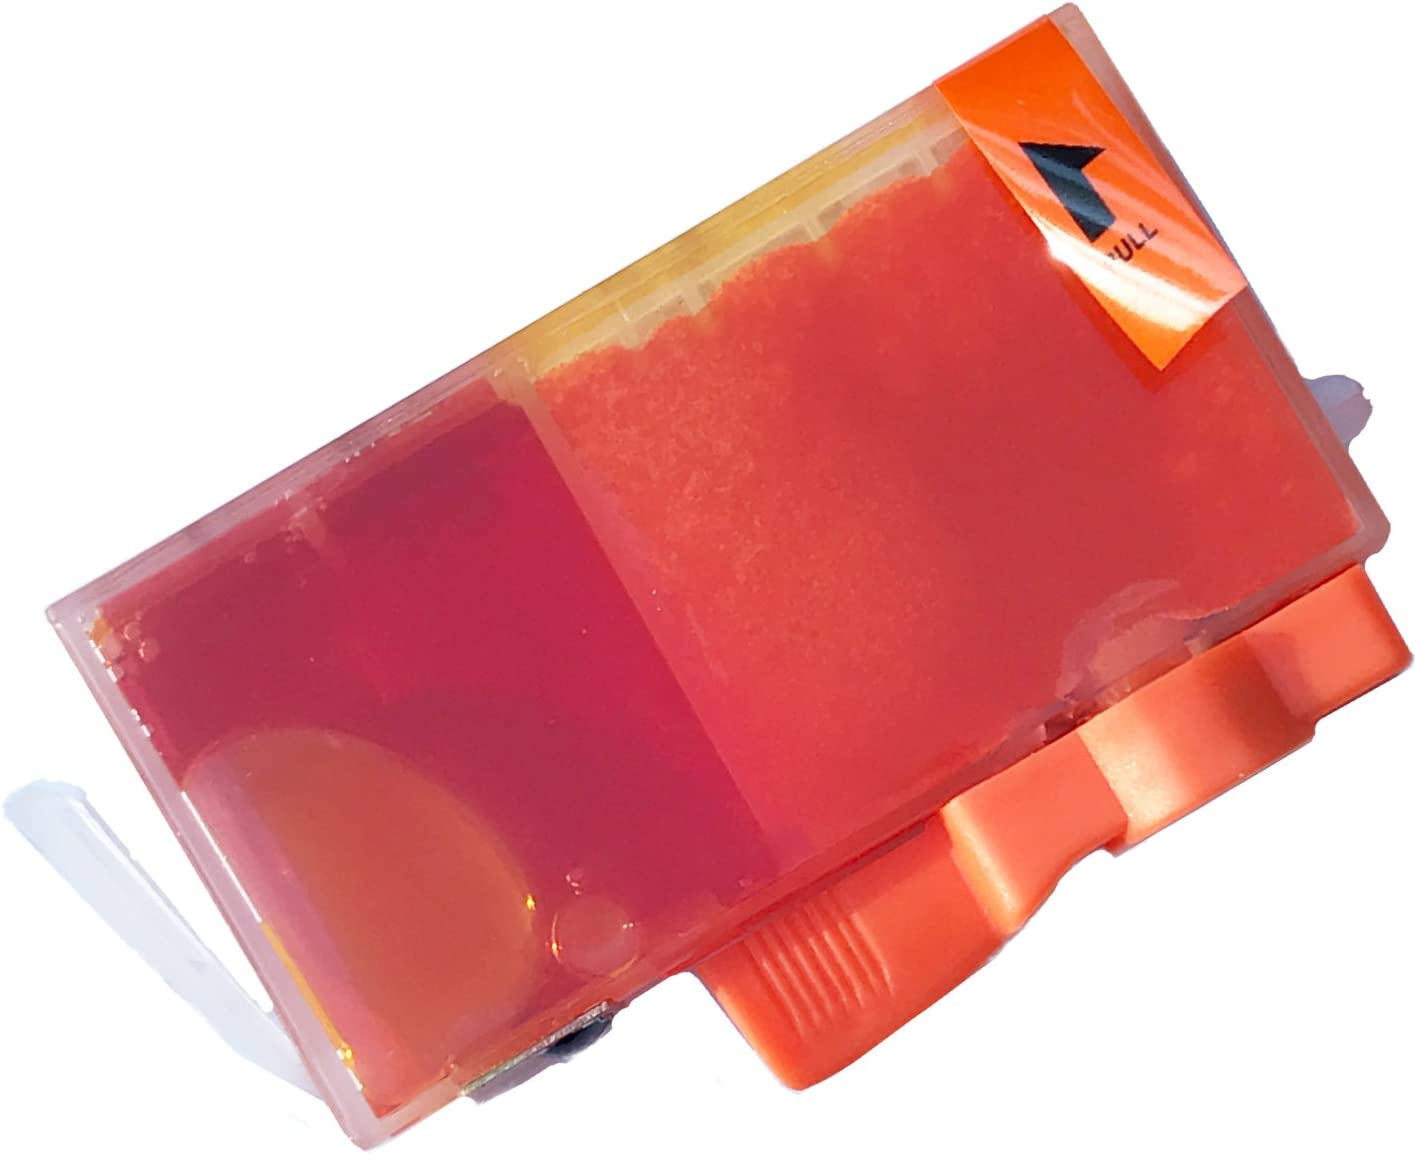 Inkoink Compatible Ink Cartridge Replacement for HP 564XL HP Printer Photosmart 5510 5512 5522 B110a B8550 6510 6520 7510 7515 7525 B109n D5463 D5440 Officejet 4610 4620 4622 Deskjet 3520 3521-4 Pack